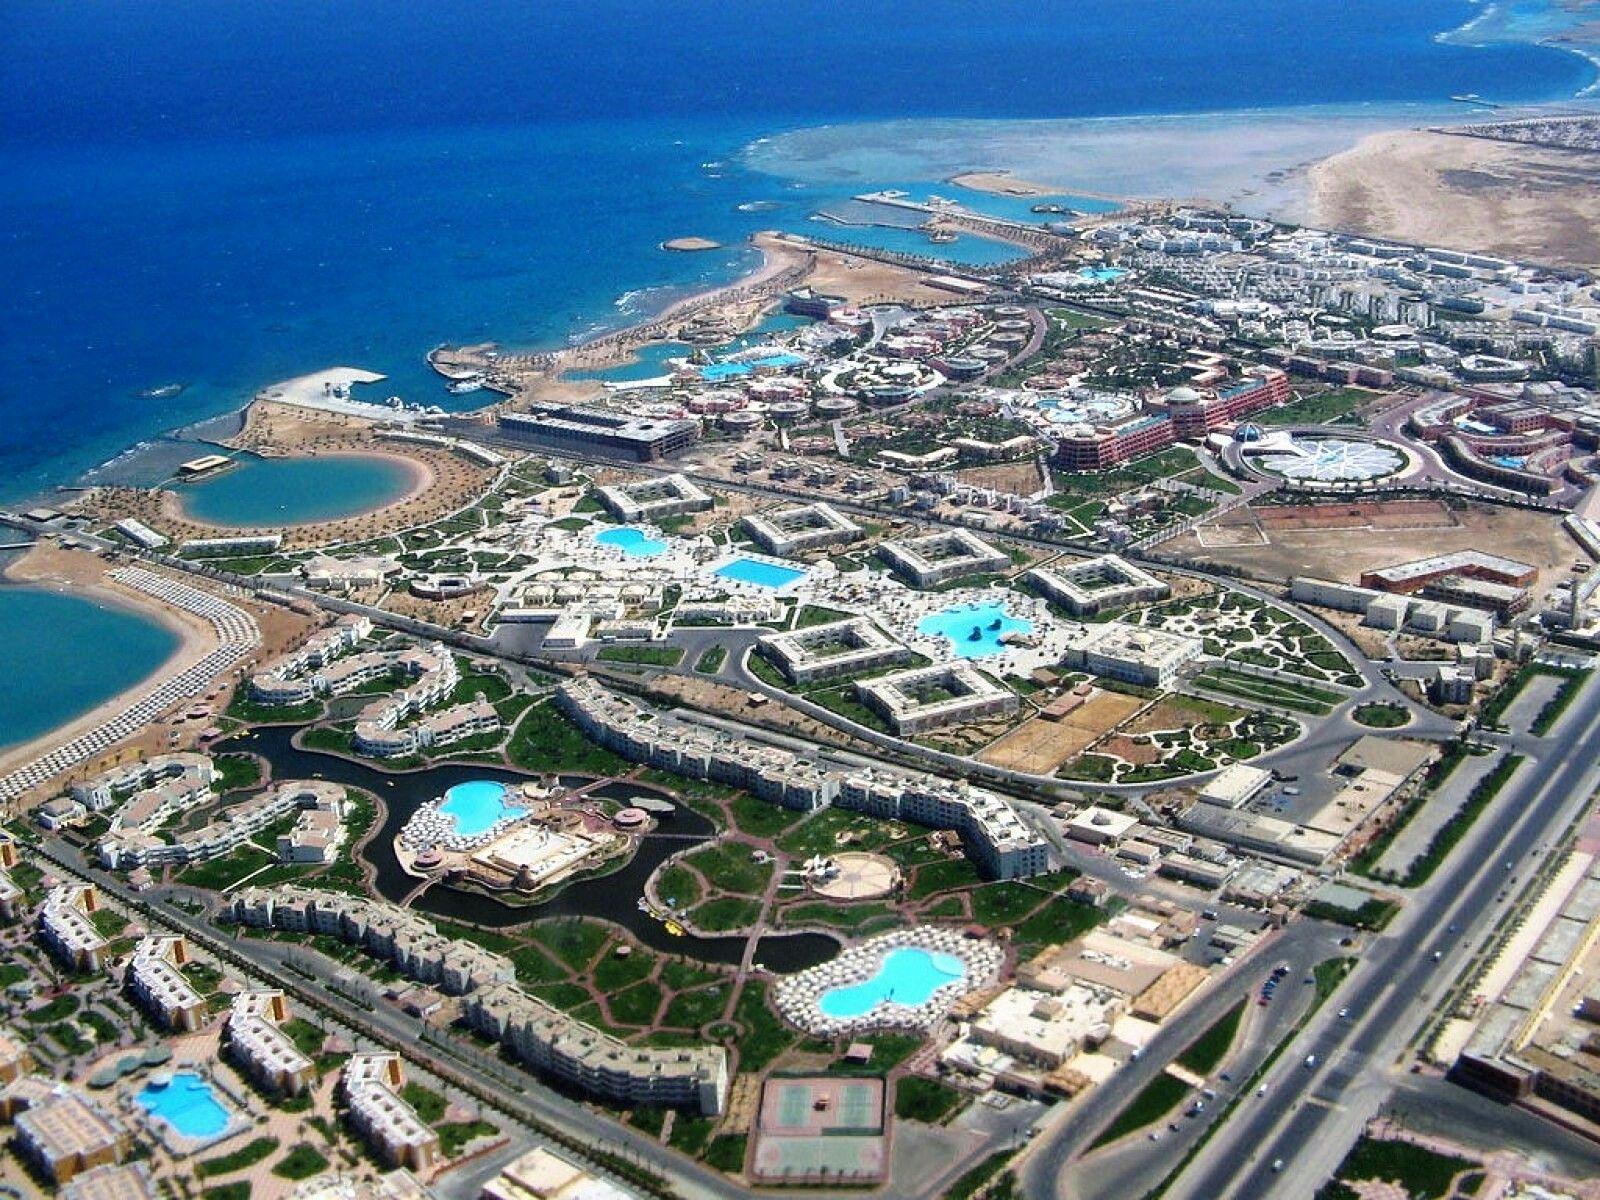 Pin By Monika Palushi On Places To Visit Hurghada Hurghada Egypt Egypt Tours